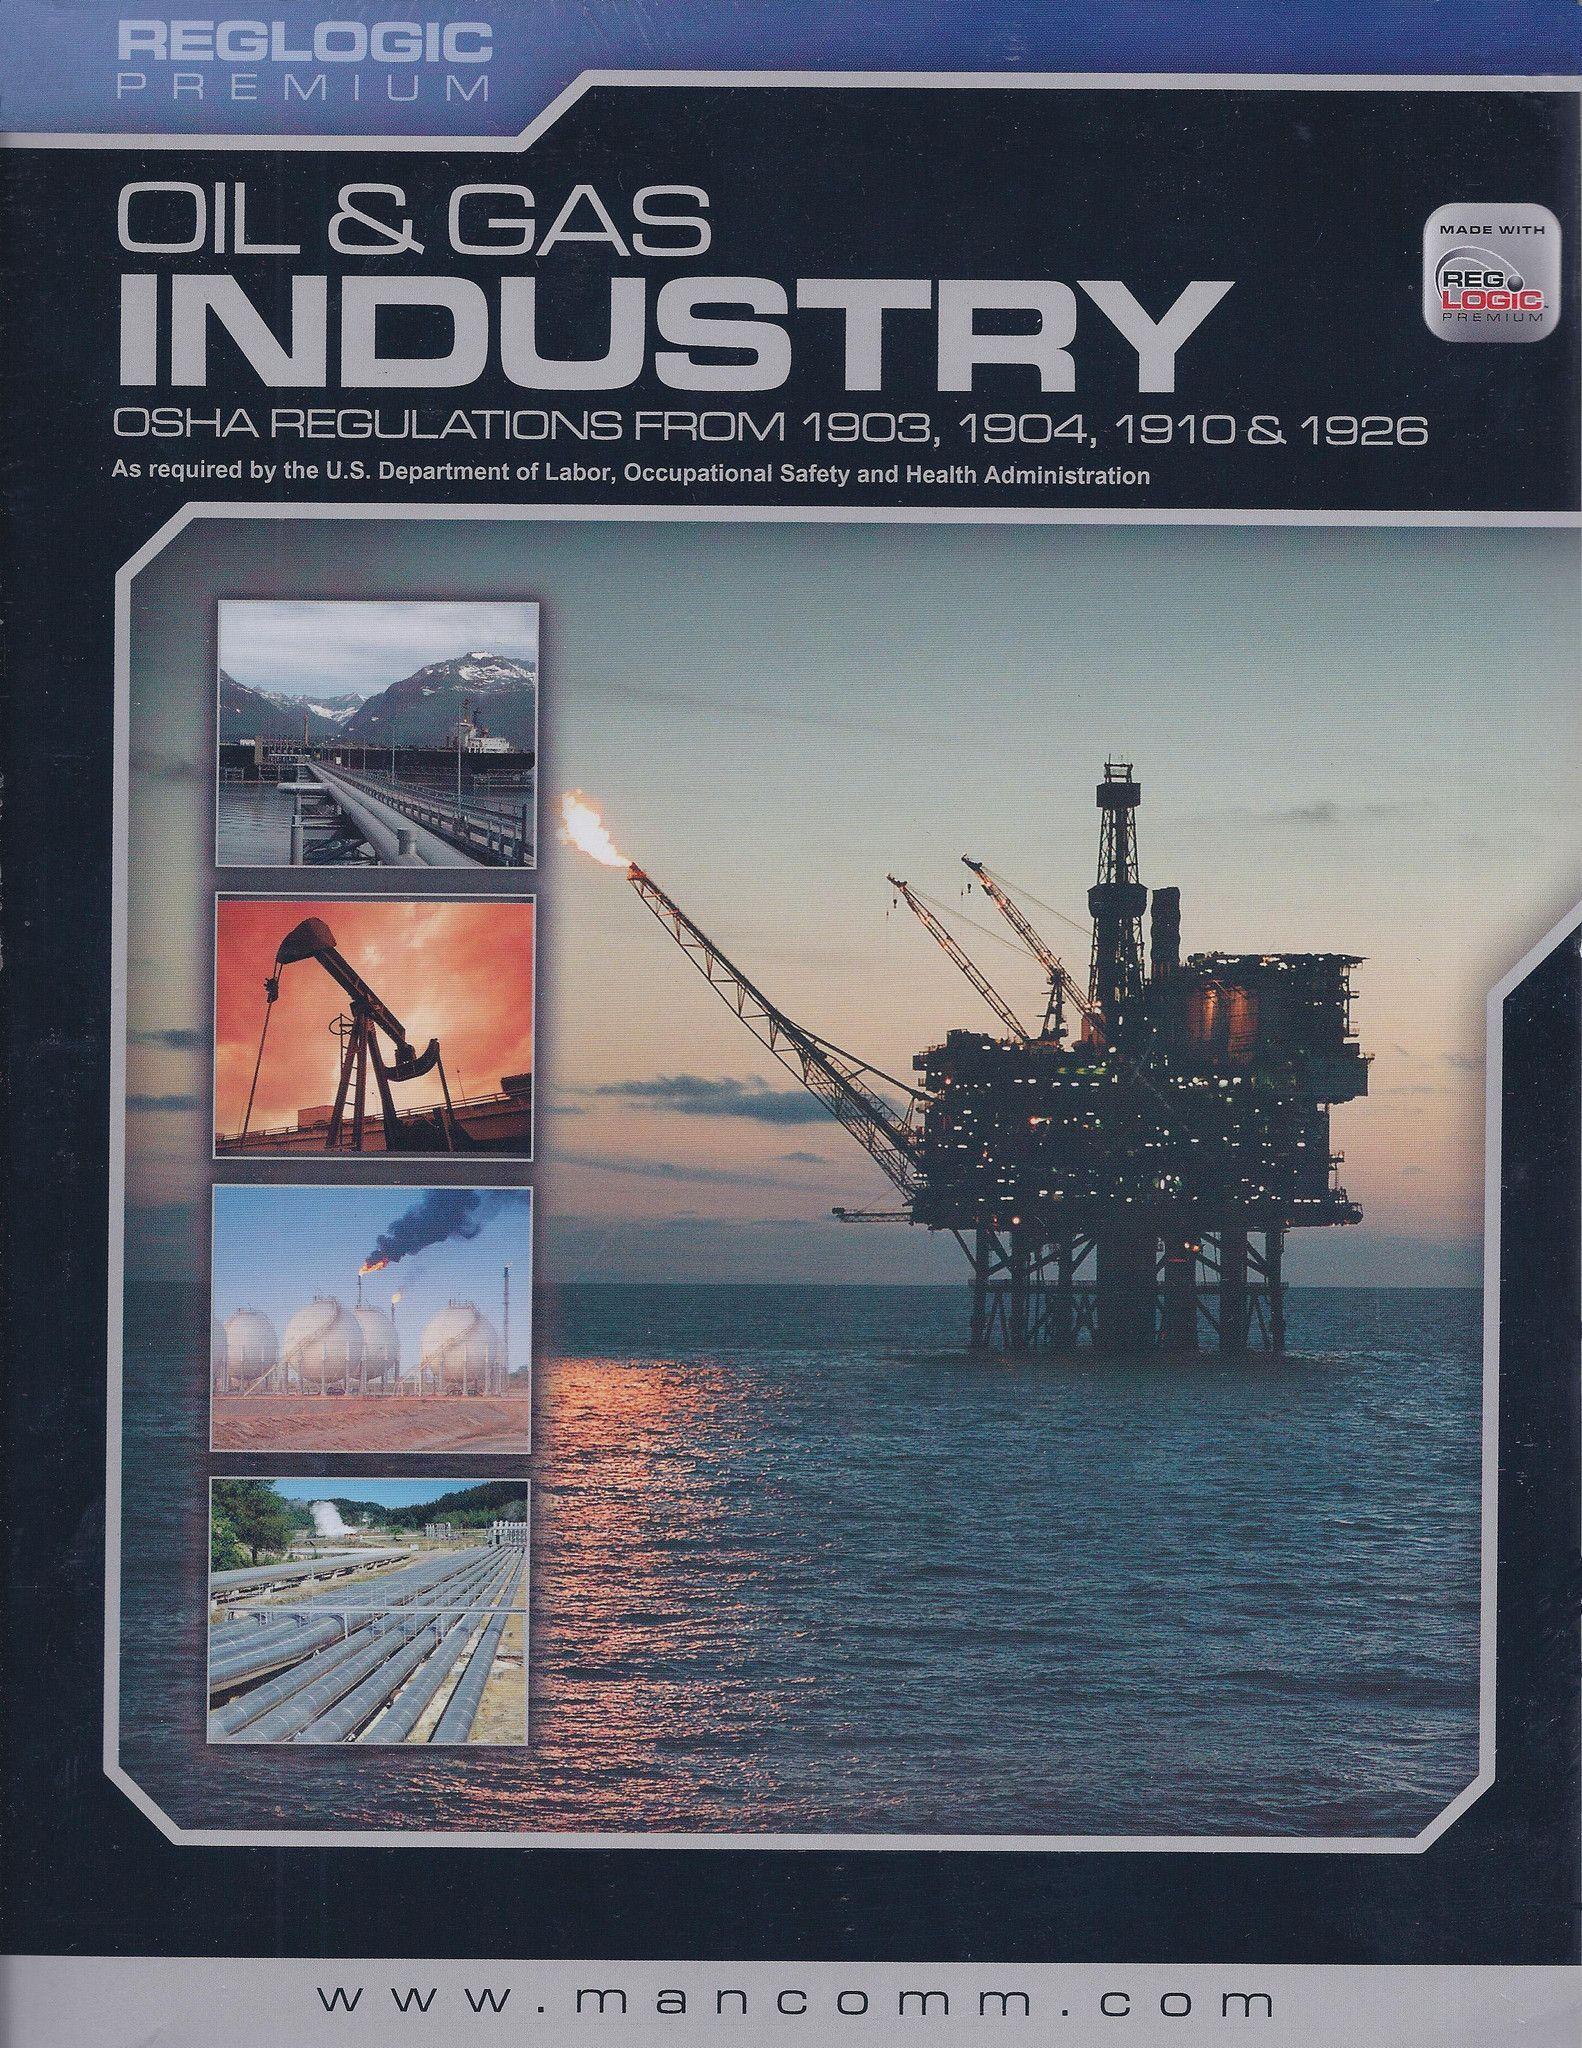 OSHA Oil & Gas Regulations Occupational health and